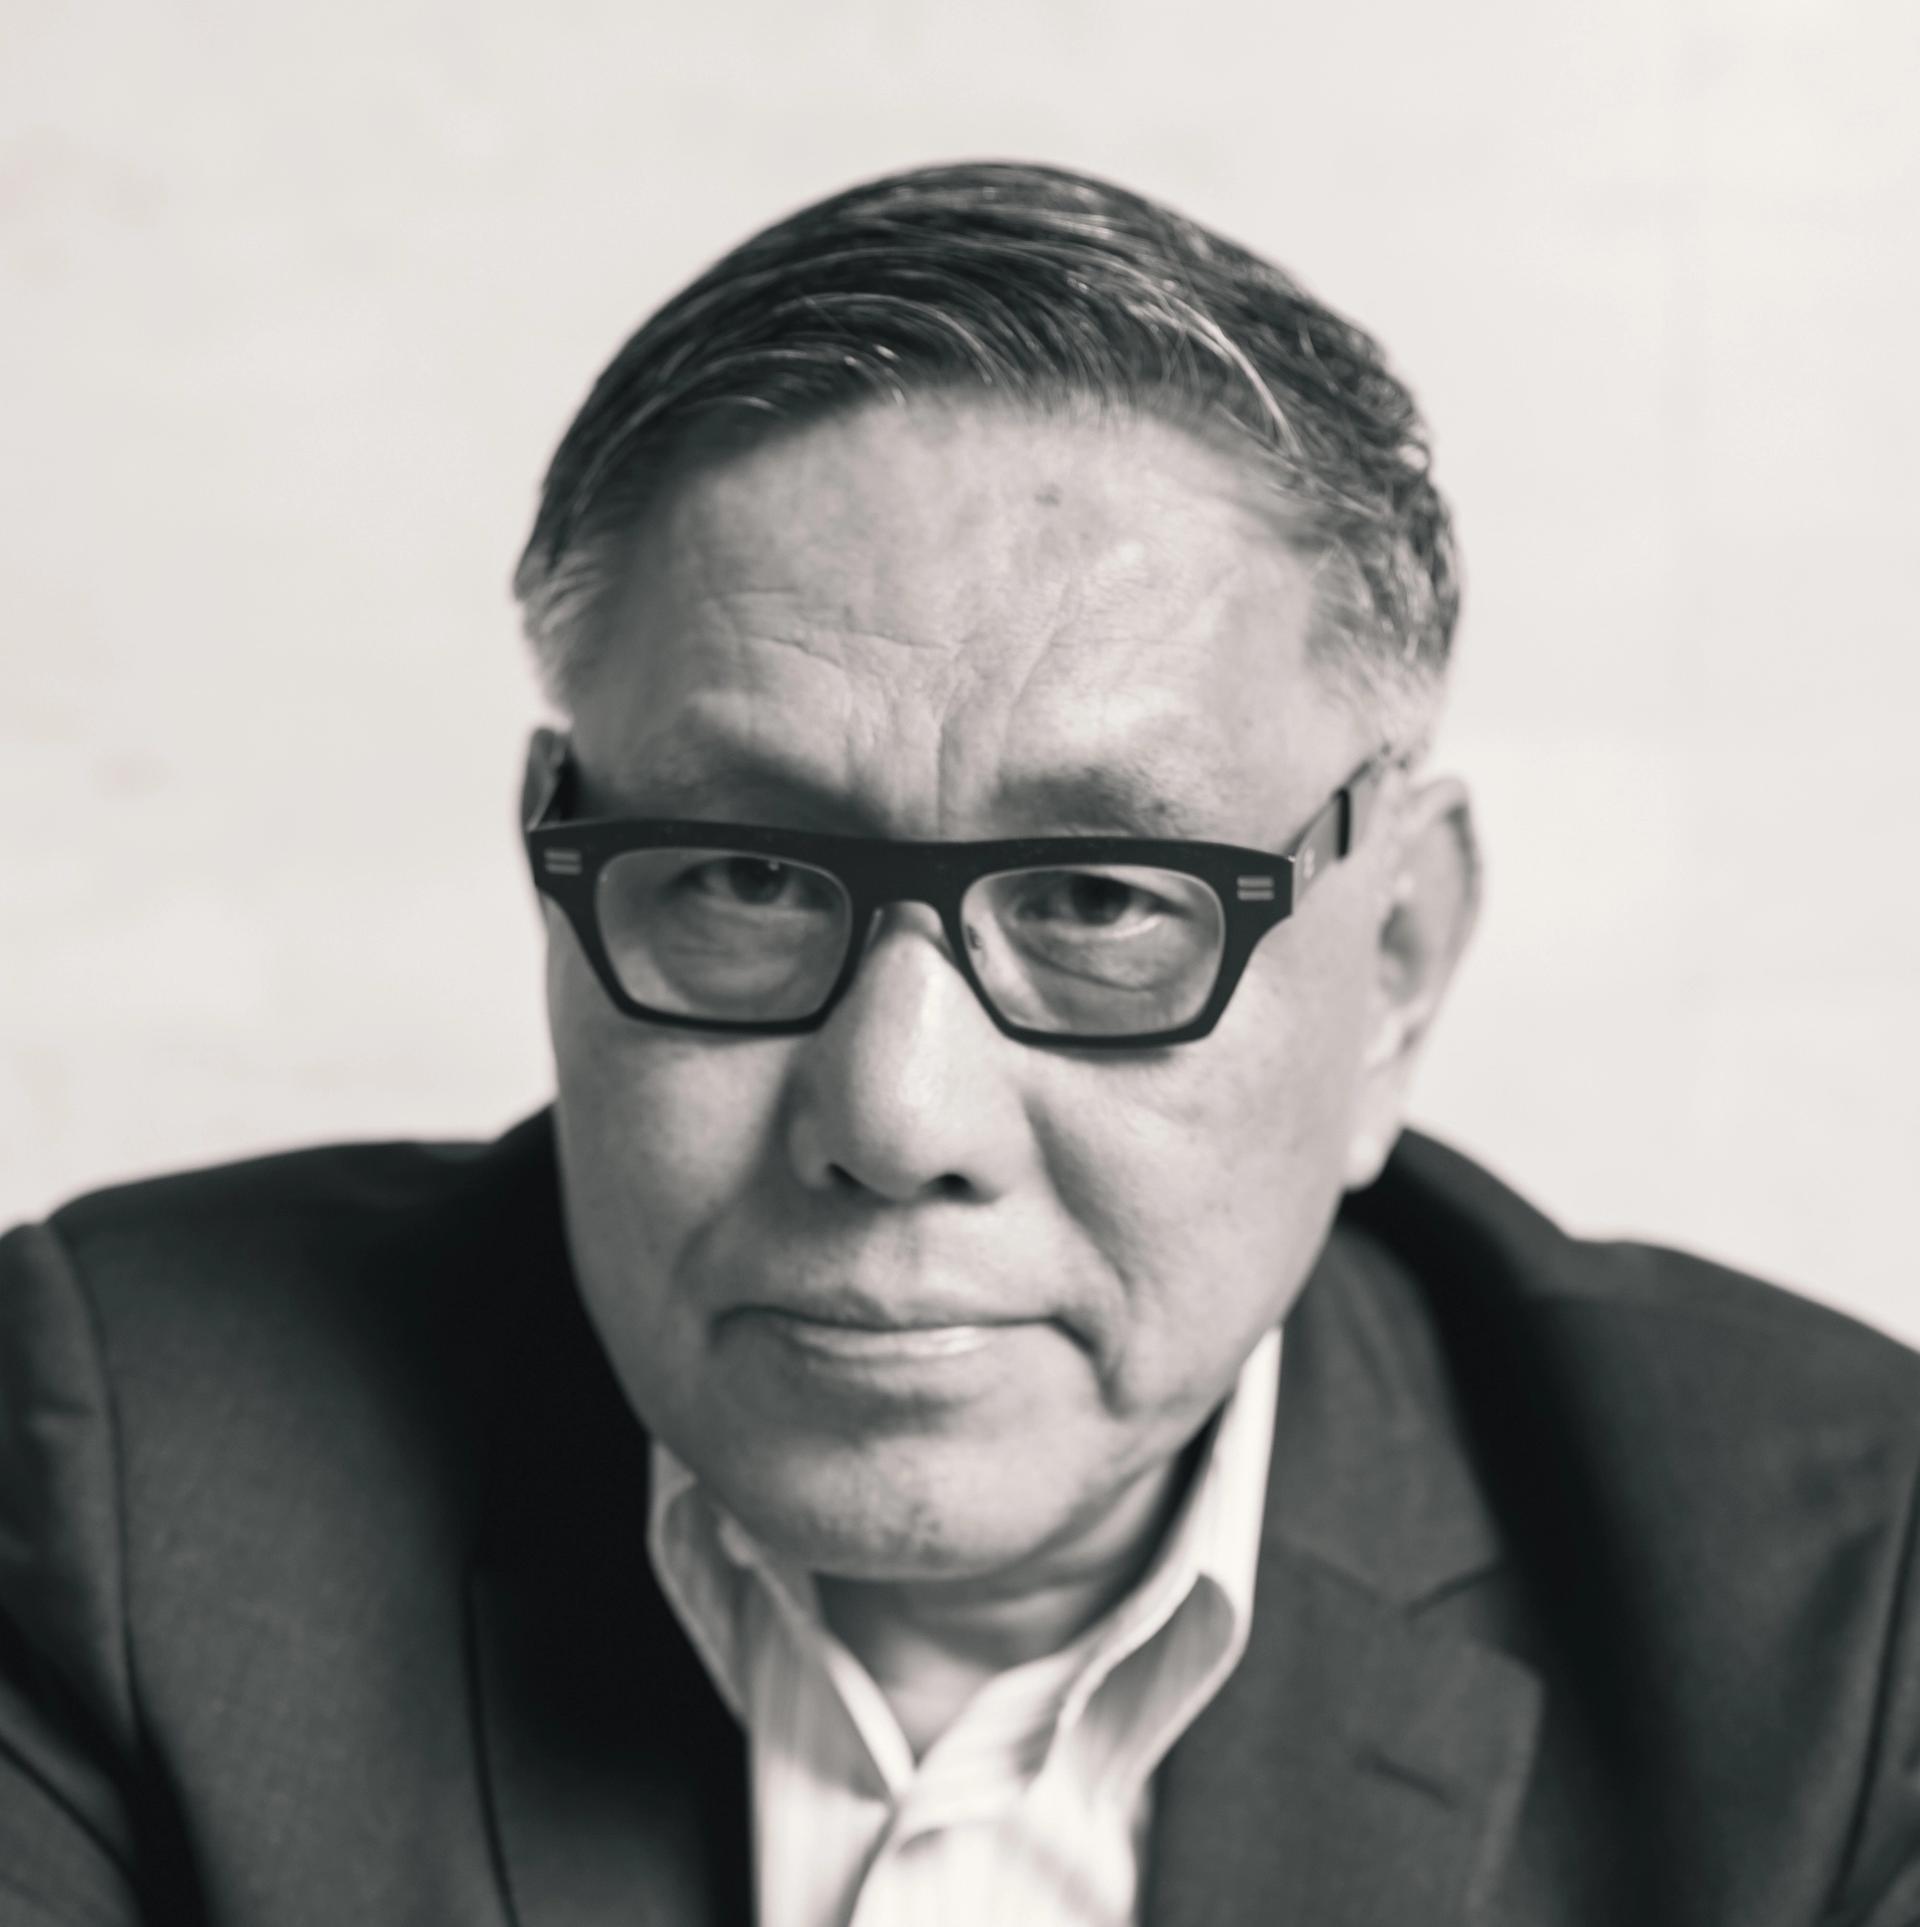 Wu Hung, Harrie A. Vanderstappen Distinguished Service Professor of Art History, University of Chicago